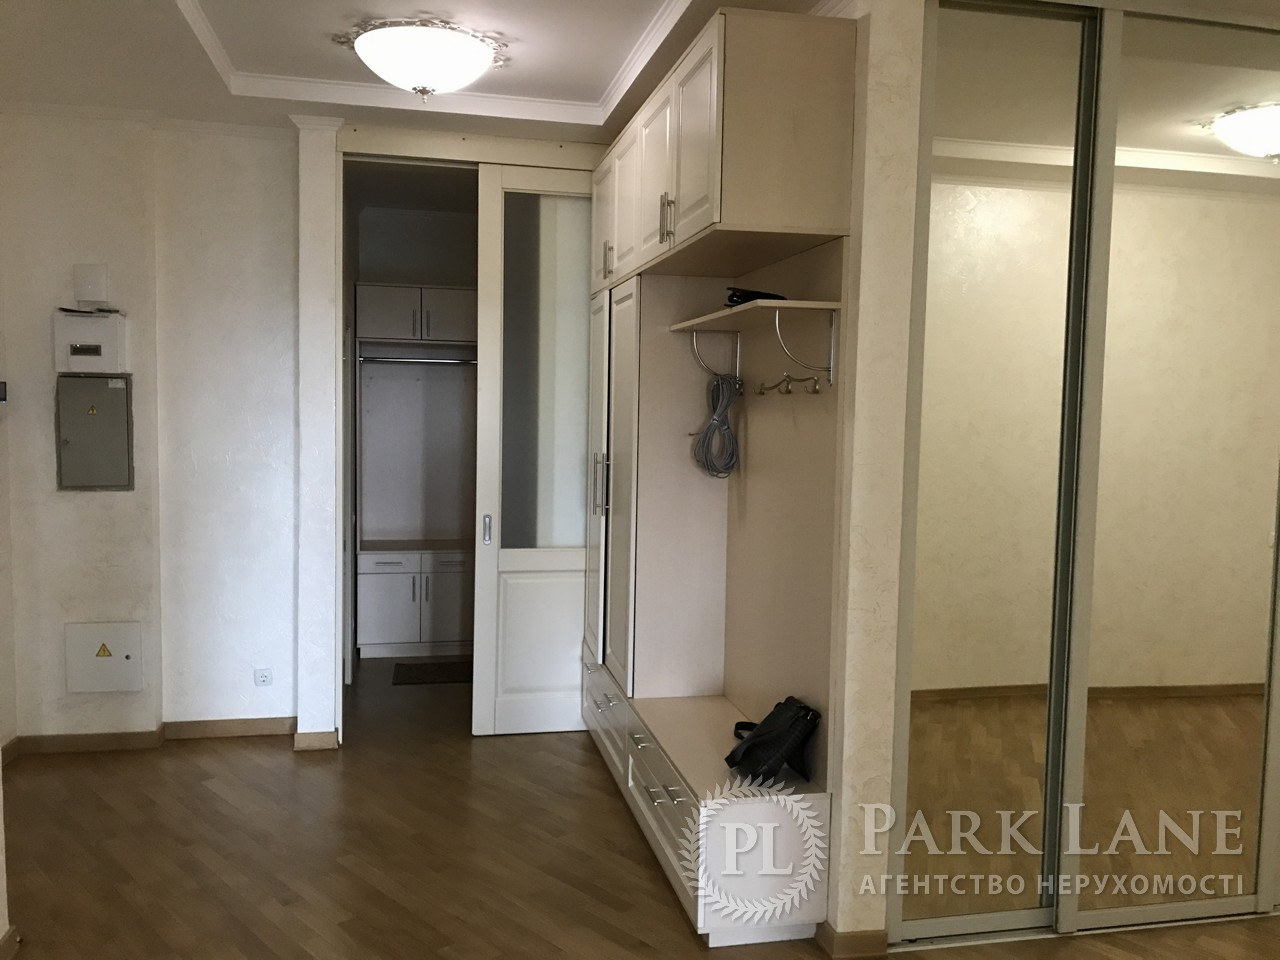 Квартира R-11328, Толстого Льва, 39, Киев - Фото 26